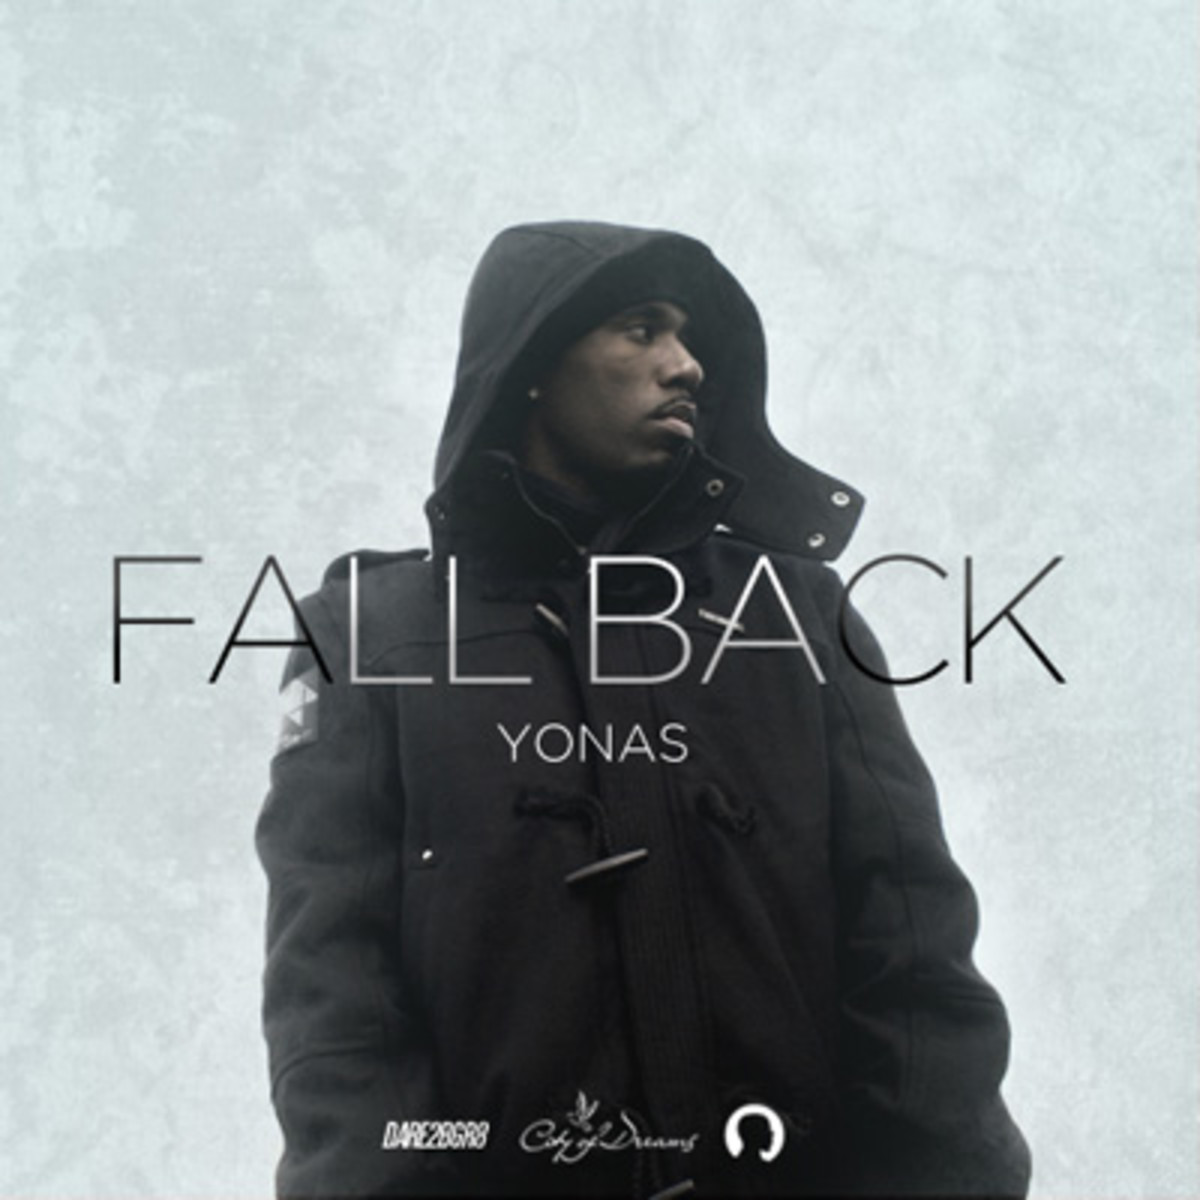 yonas-fallback.jpg